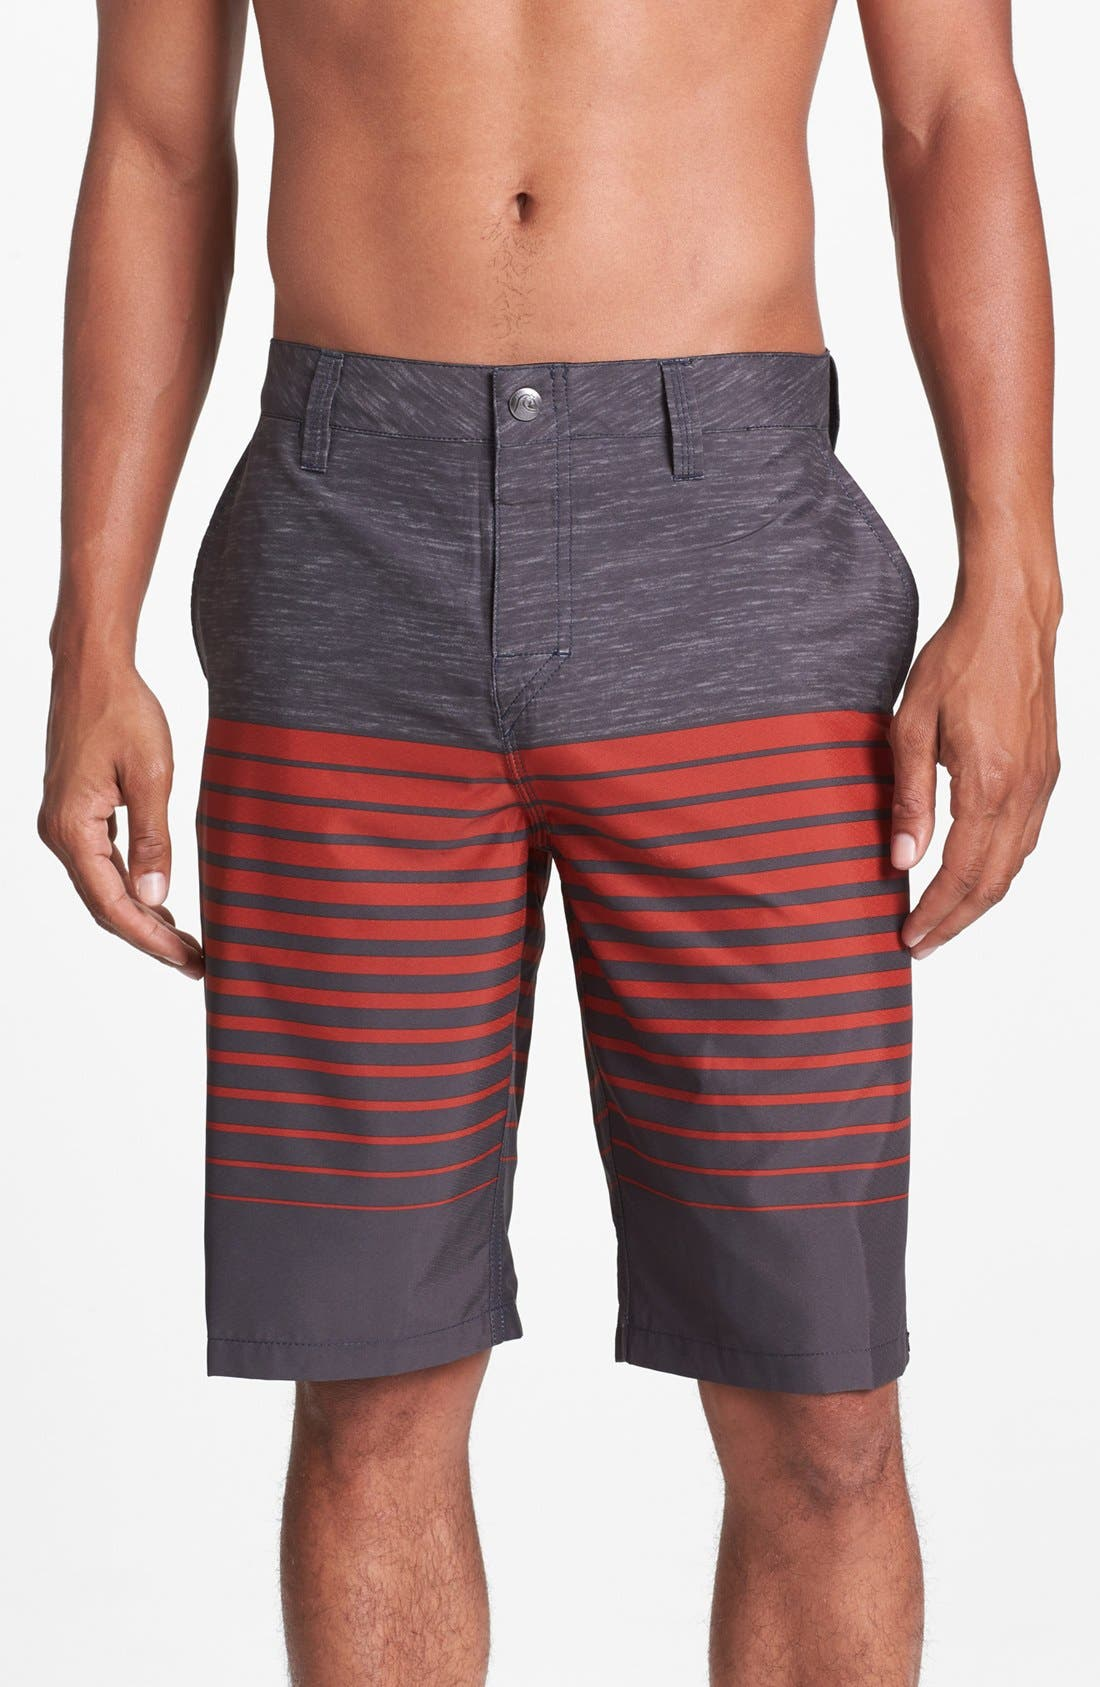 Alternate Image 1 Selected - Quiksilver 'Neolithic' Hybrid Shorts